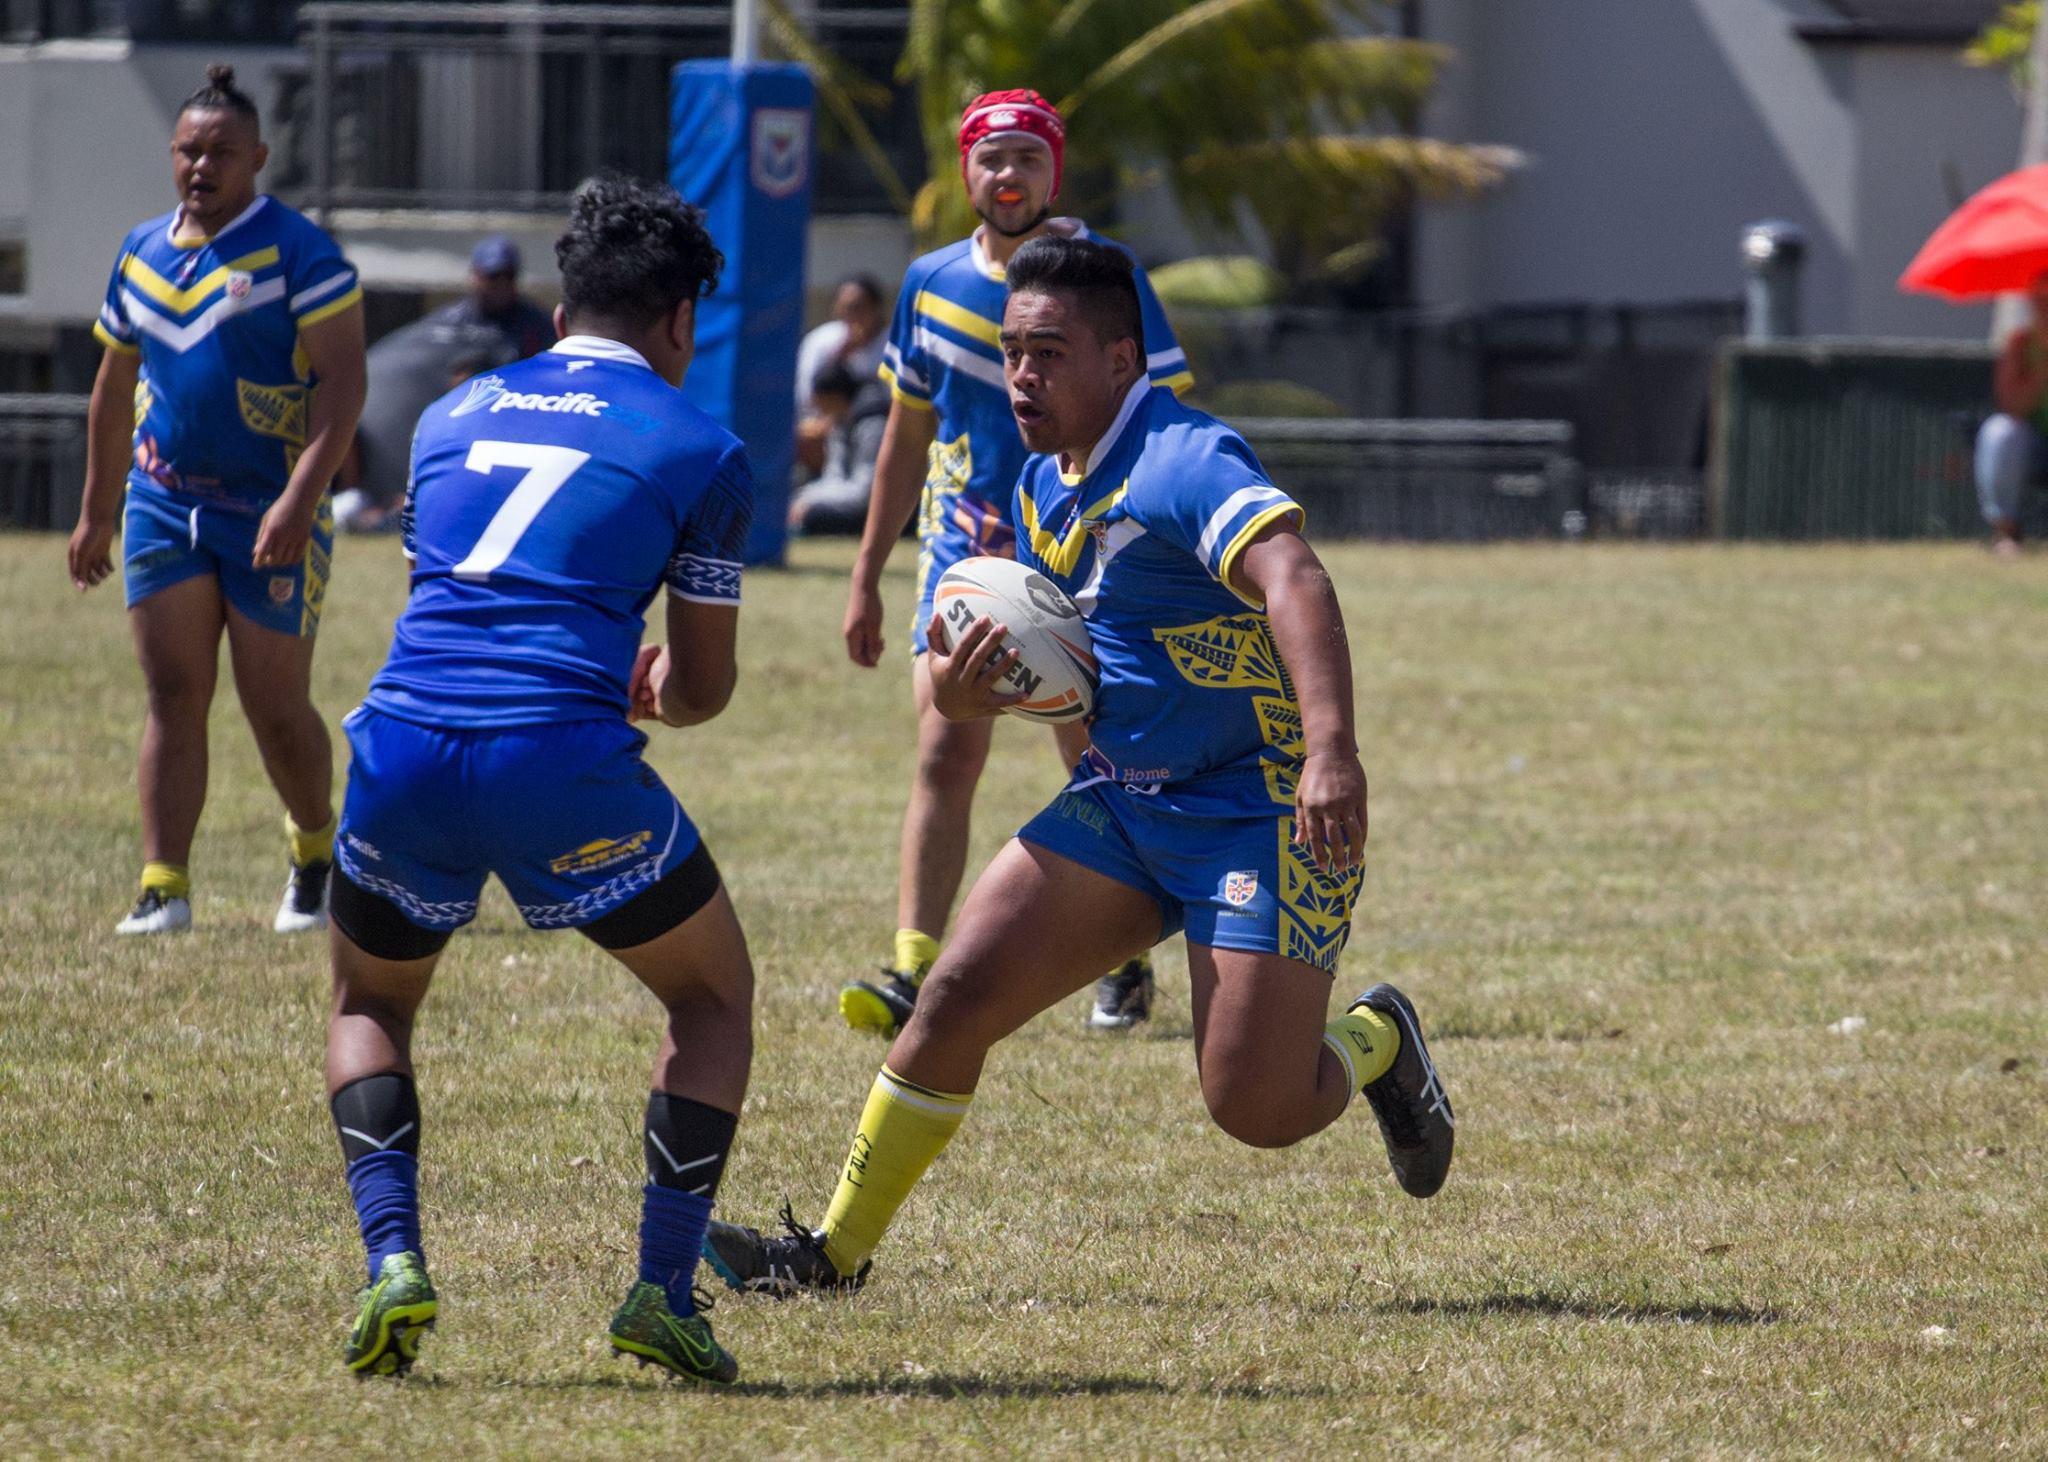 Samoa and Maori claim honours in inaugural Pasifika Youth Cup